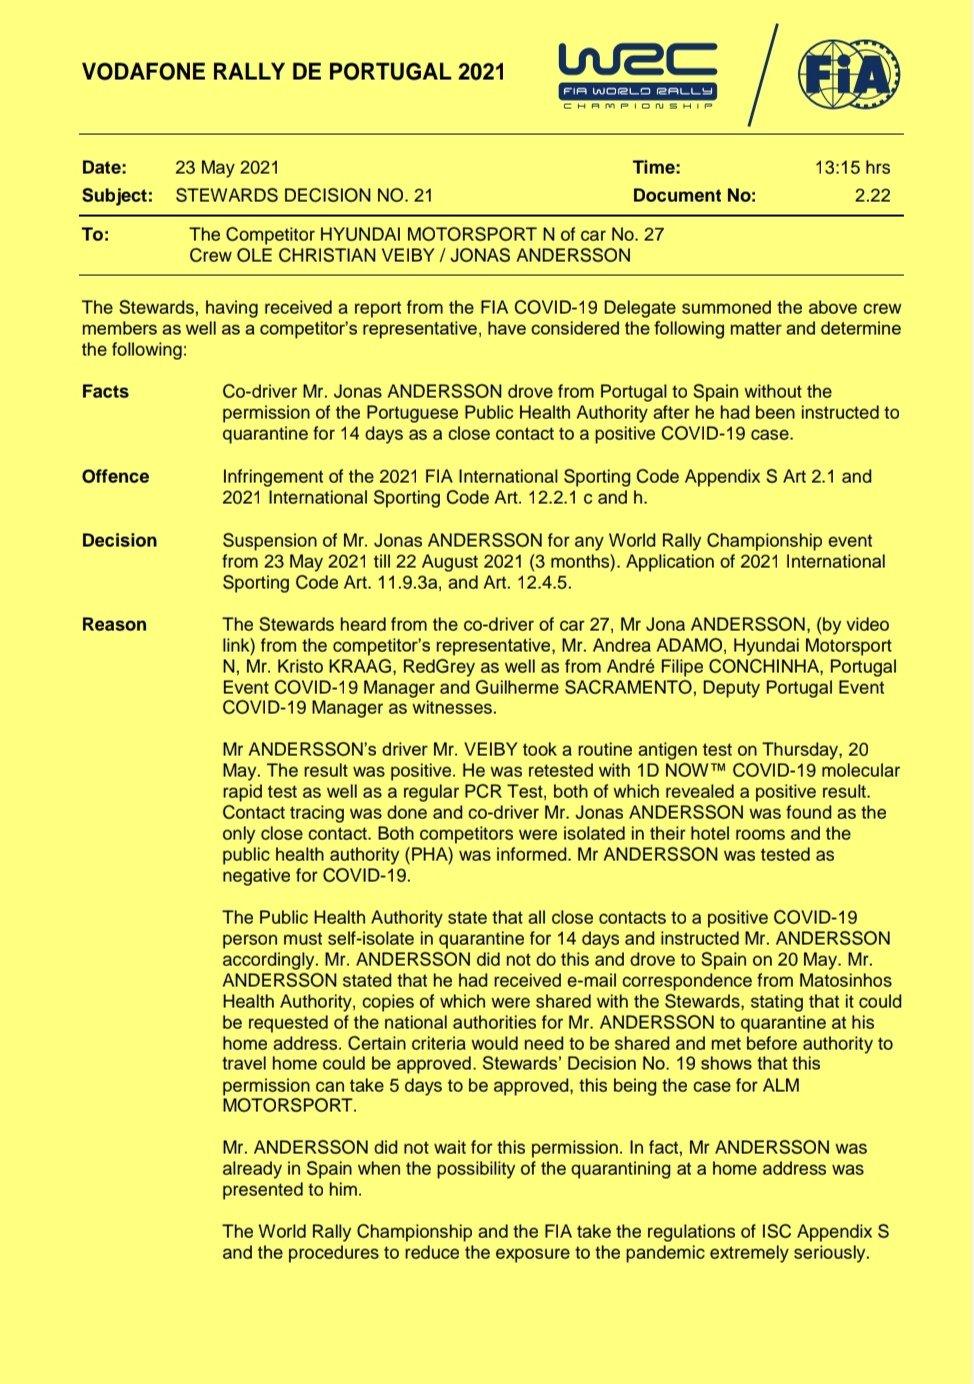 WRC: 54º Vodafone Rallye de Portugal [20-23 de Mayo] - Página 6 E2FhI-dXoAIxaqP?format=jpg&name=large